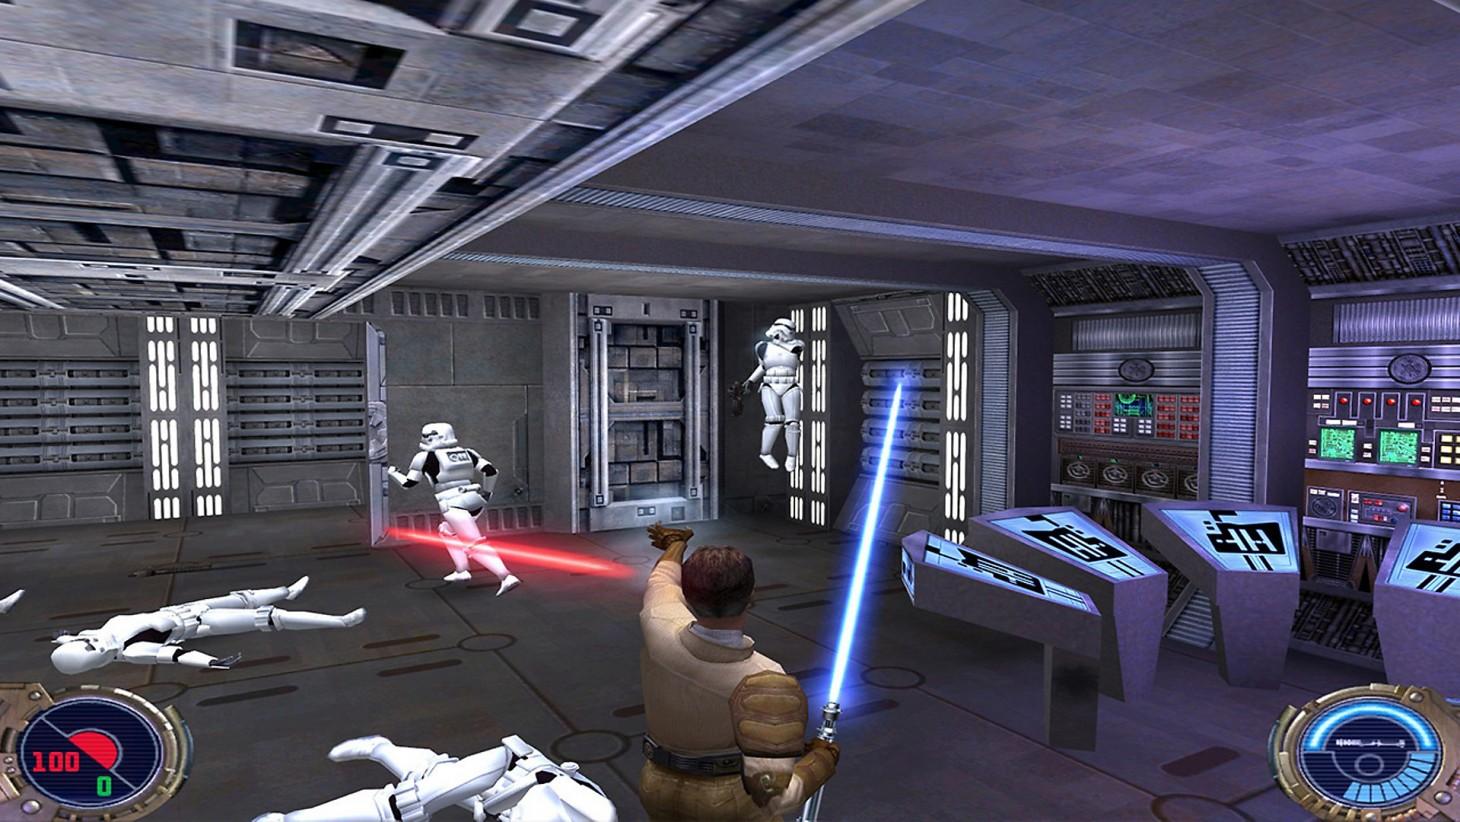 Jedi Lucasarts